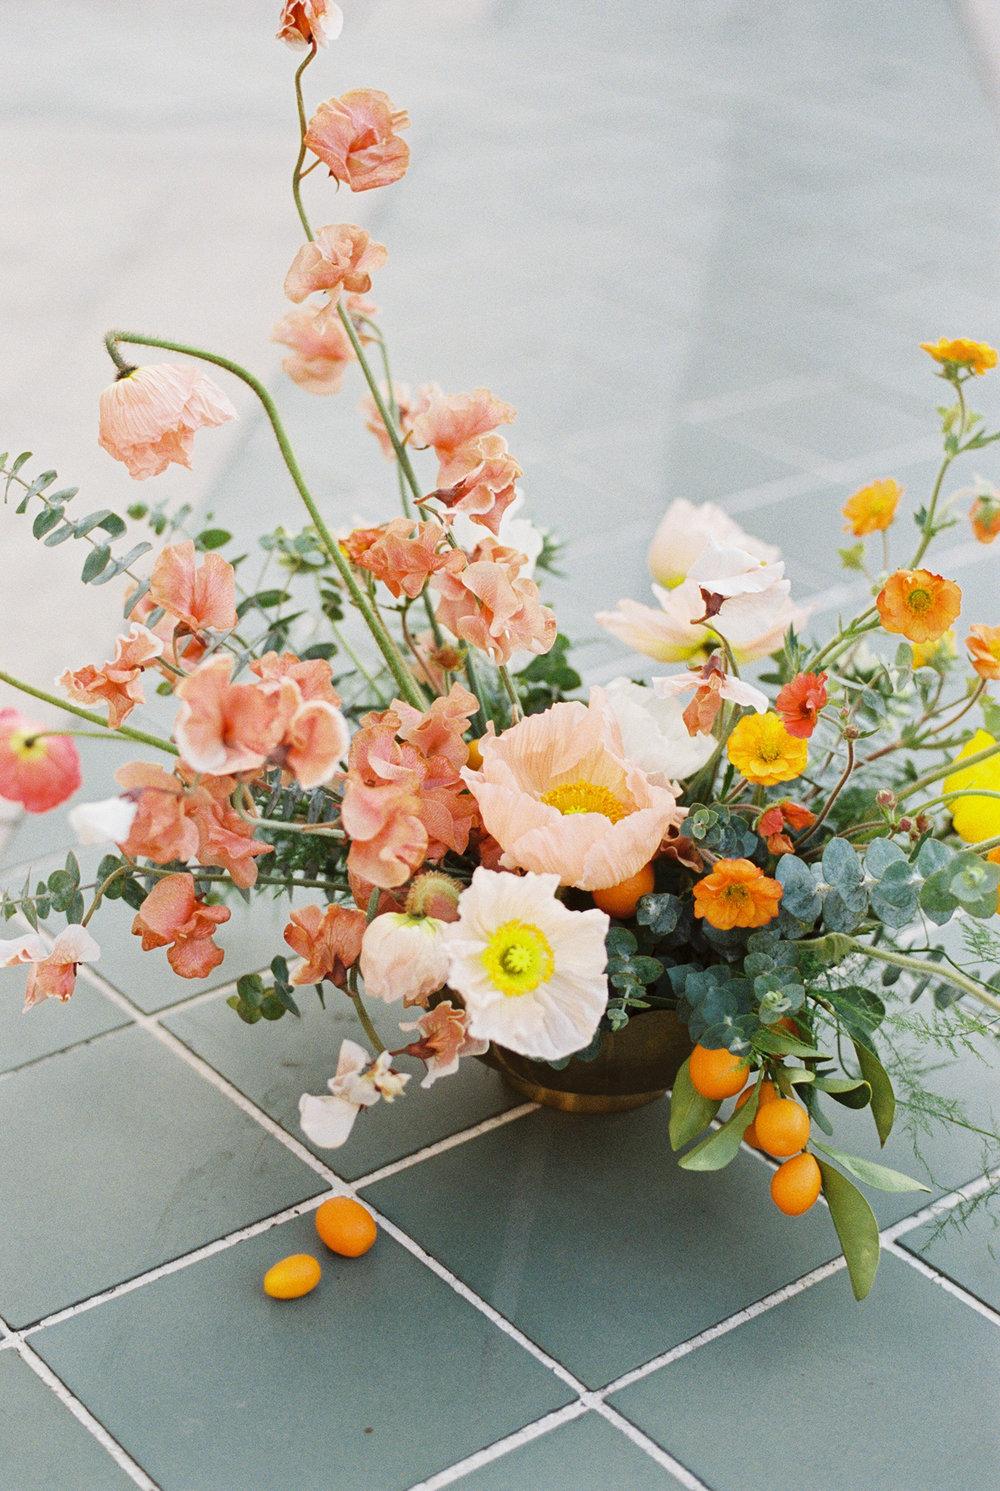 Fine Art Wedding Florist - Dallas, Texas - Olive Grove Design - 00034.jpg